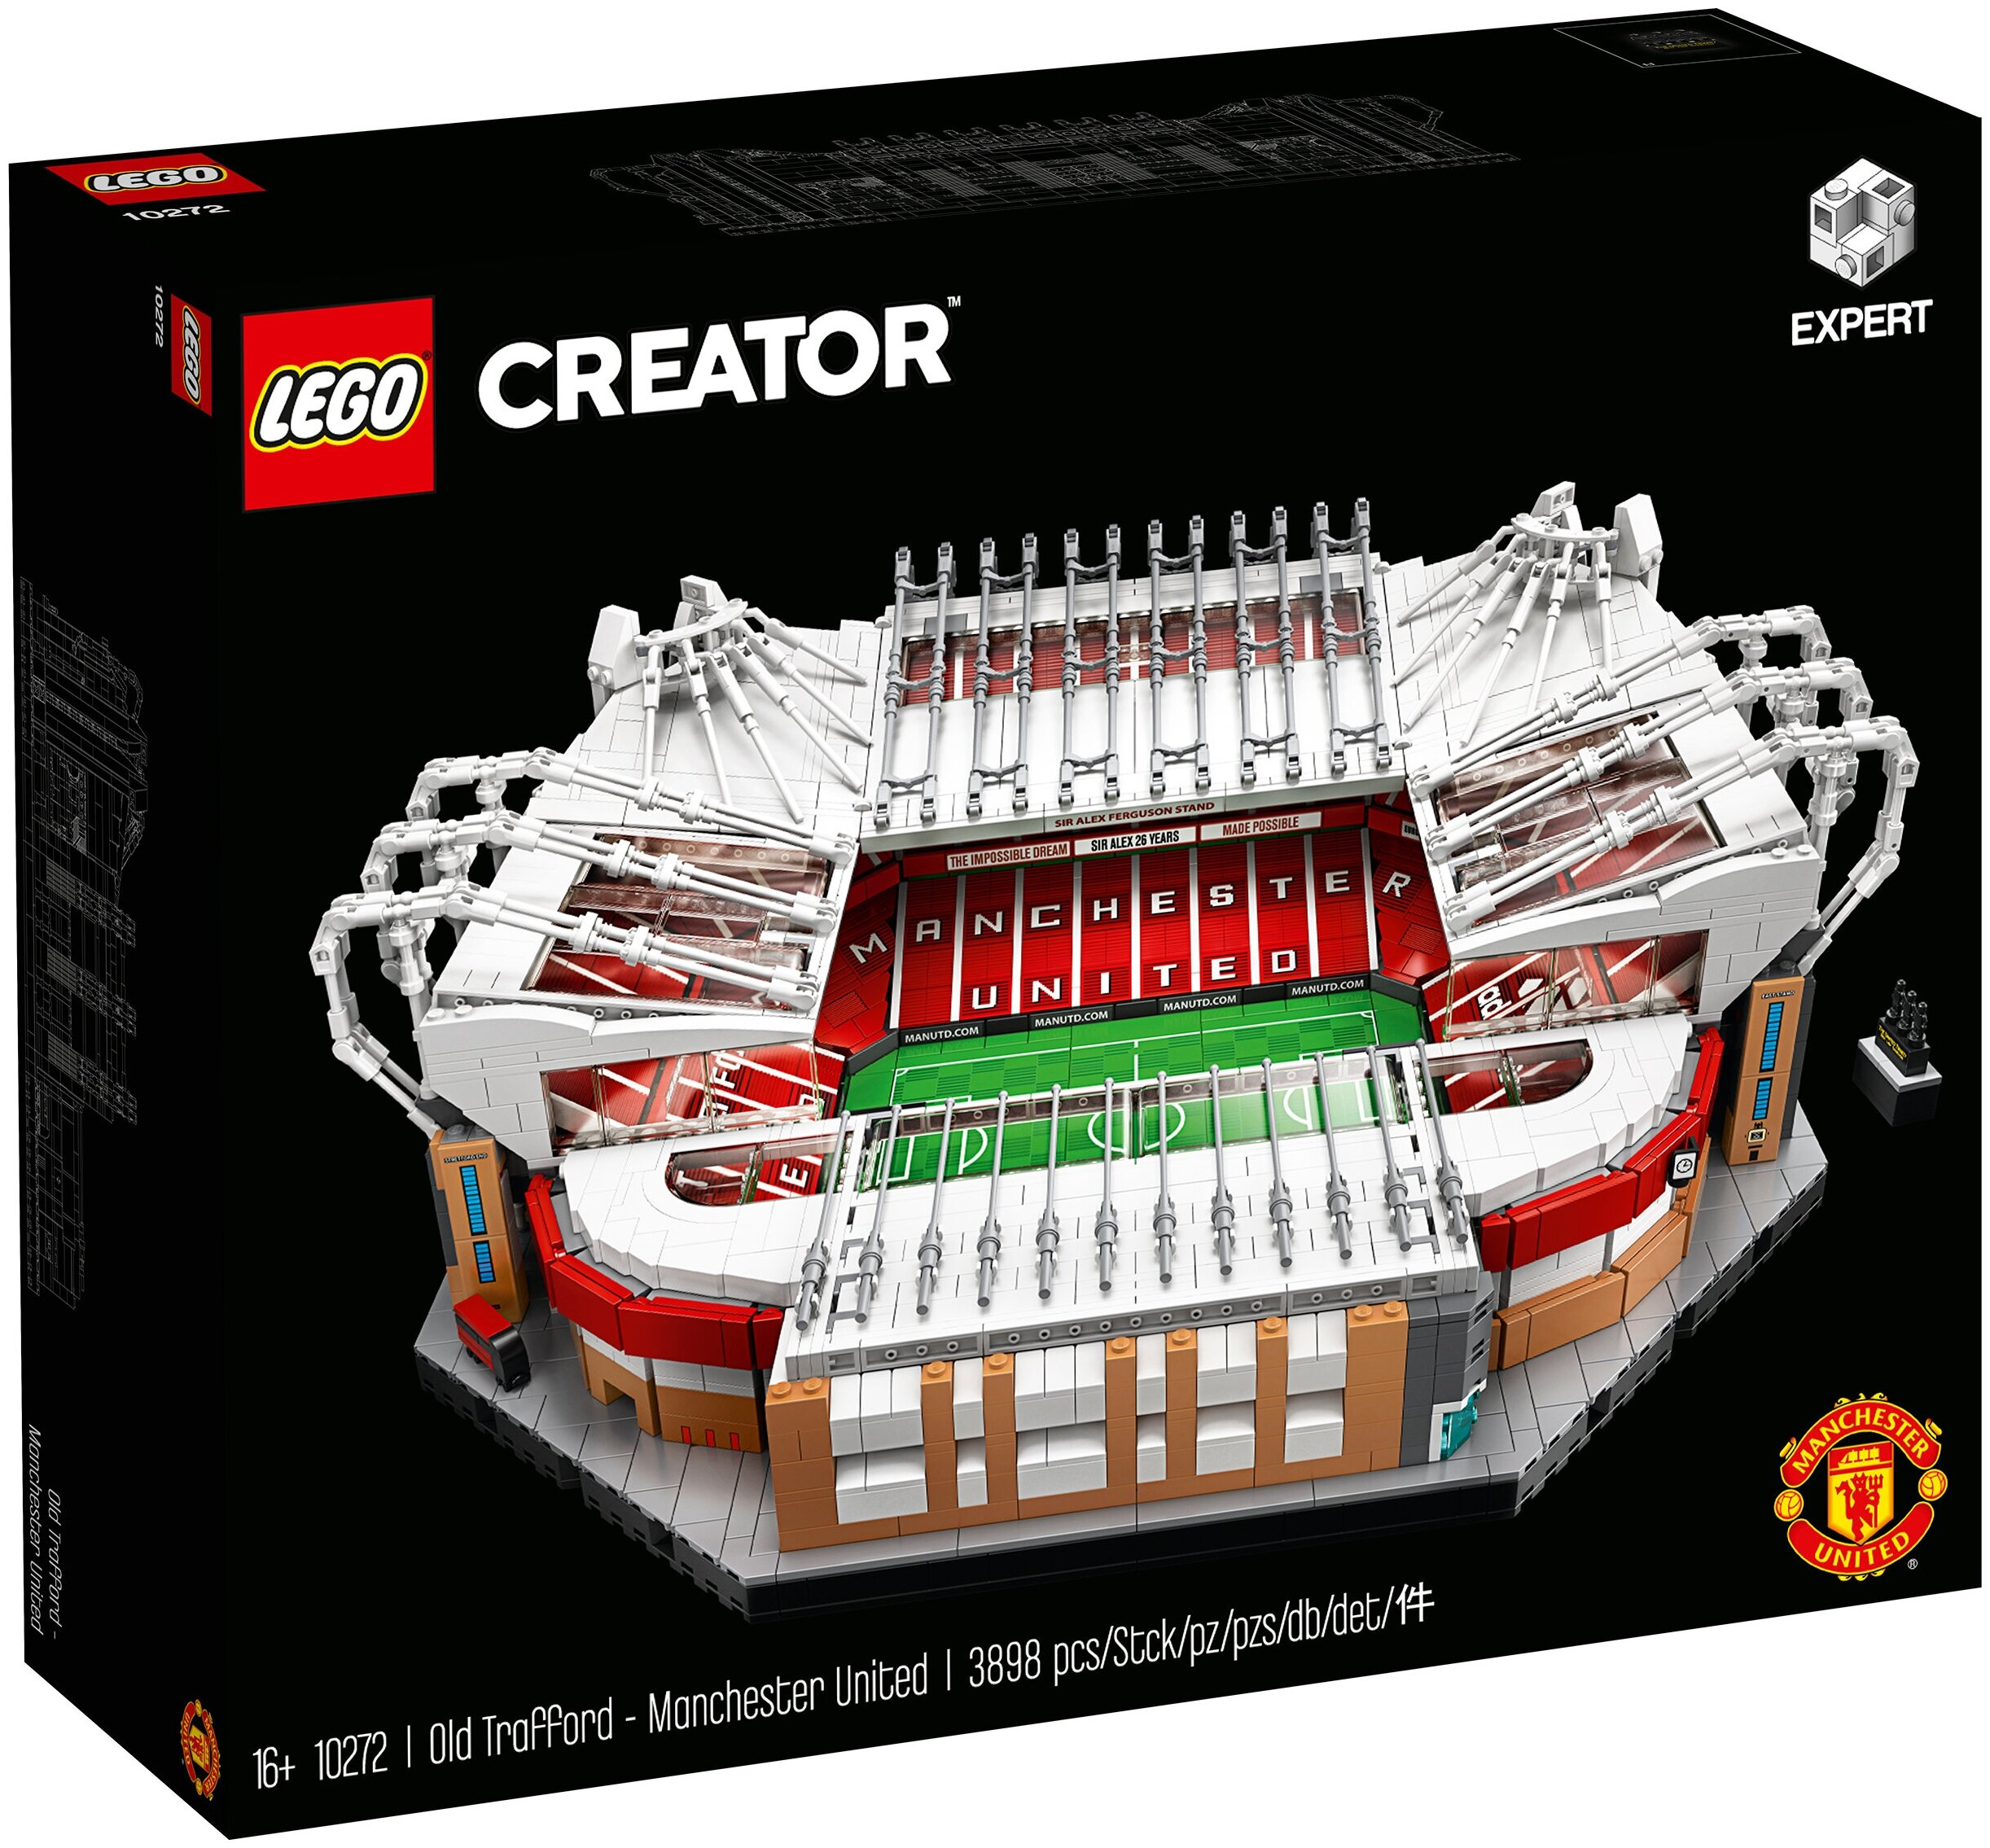 Конструктор LEGO Creator 10272 Стадион Олд Траффорд - Манчестер Юнайтед